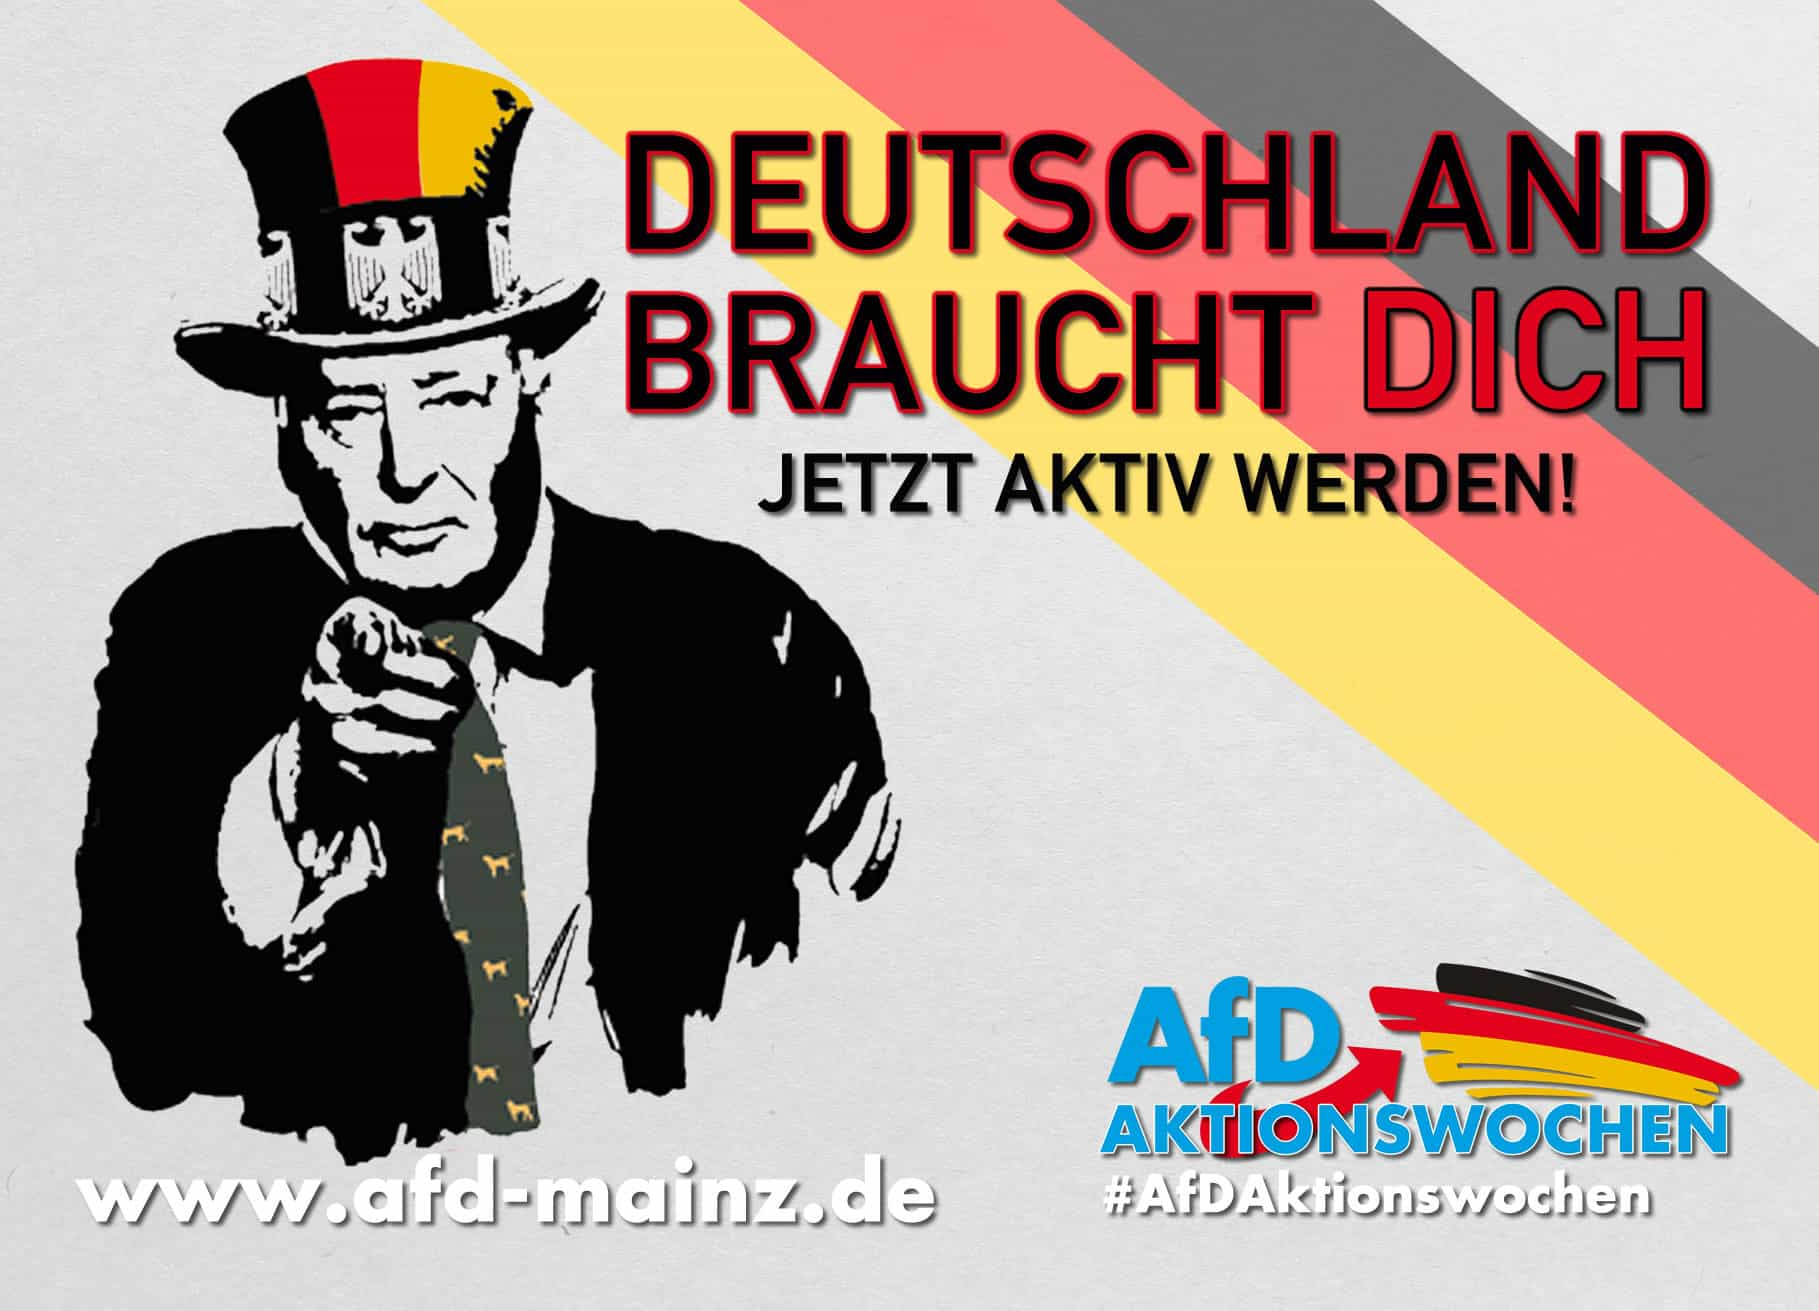 Aktionsowchen AfD Mainz